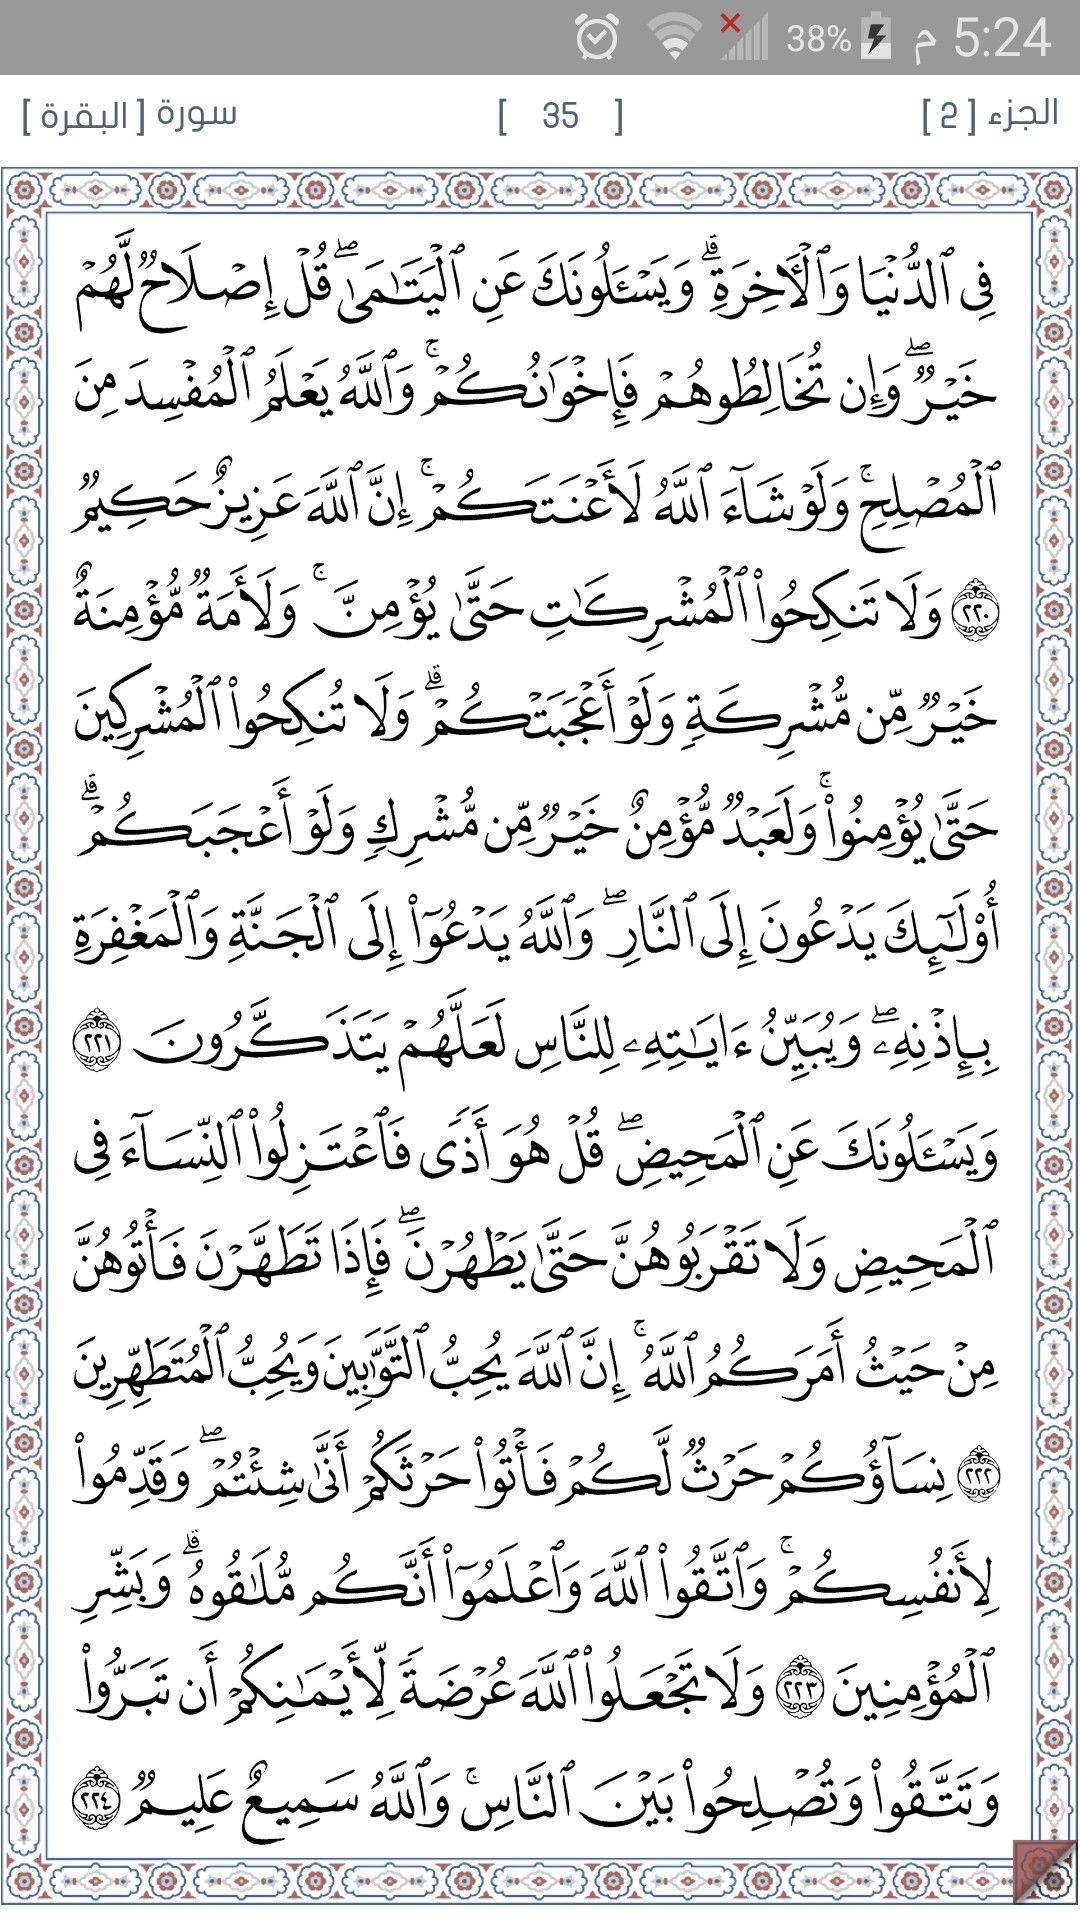 Pin By A A A A On تطبيق القرآن الكريم Quran Verses Verses Quran